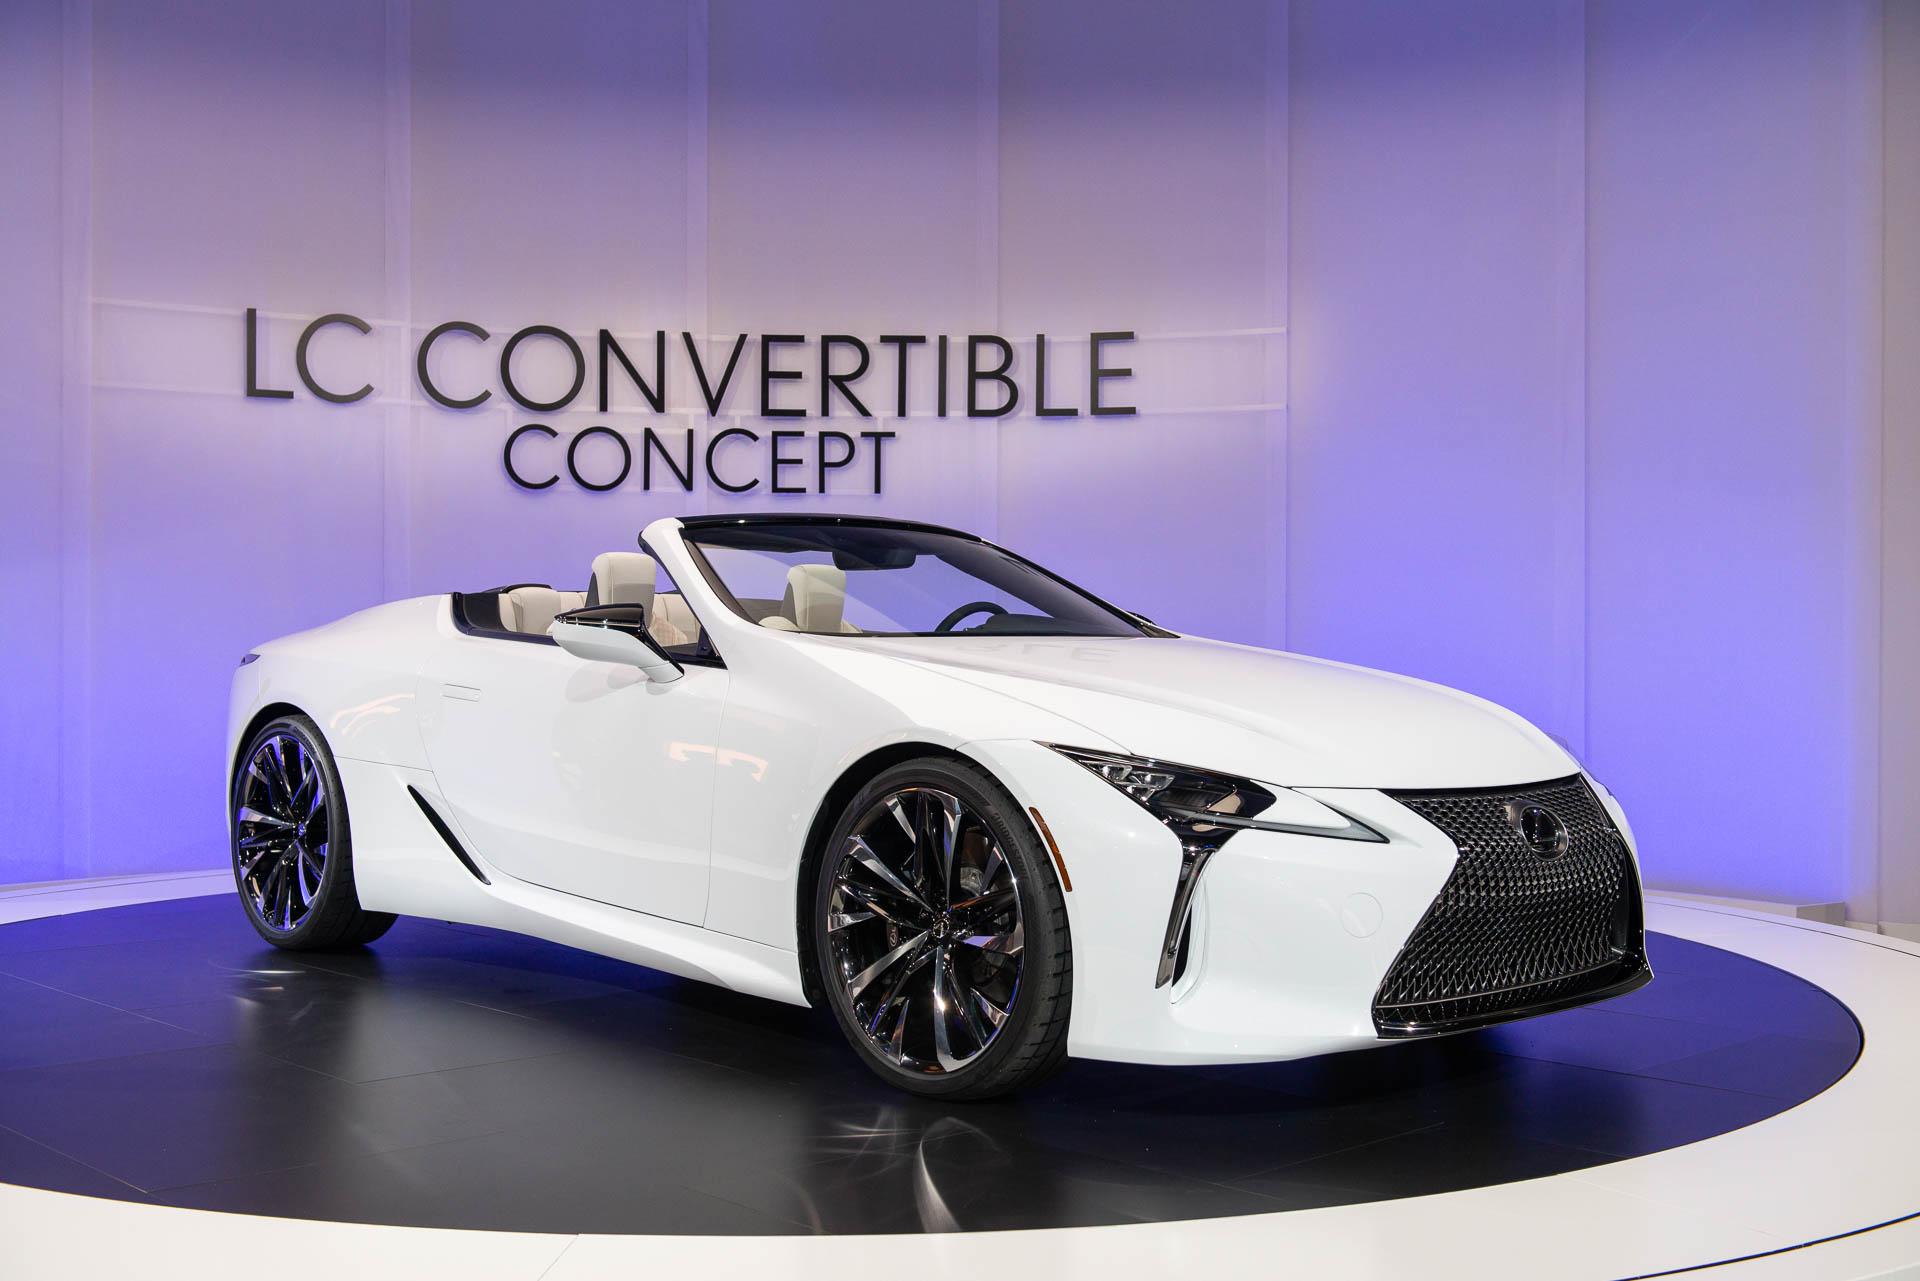 Lexus Sc Redux Lc Convertible Concept Hints At New Open Top Flagship